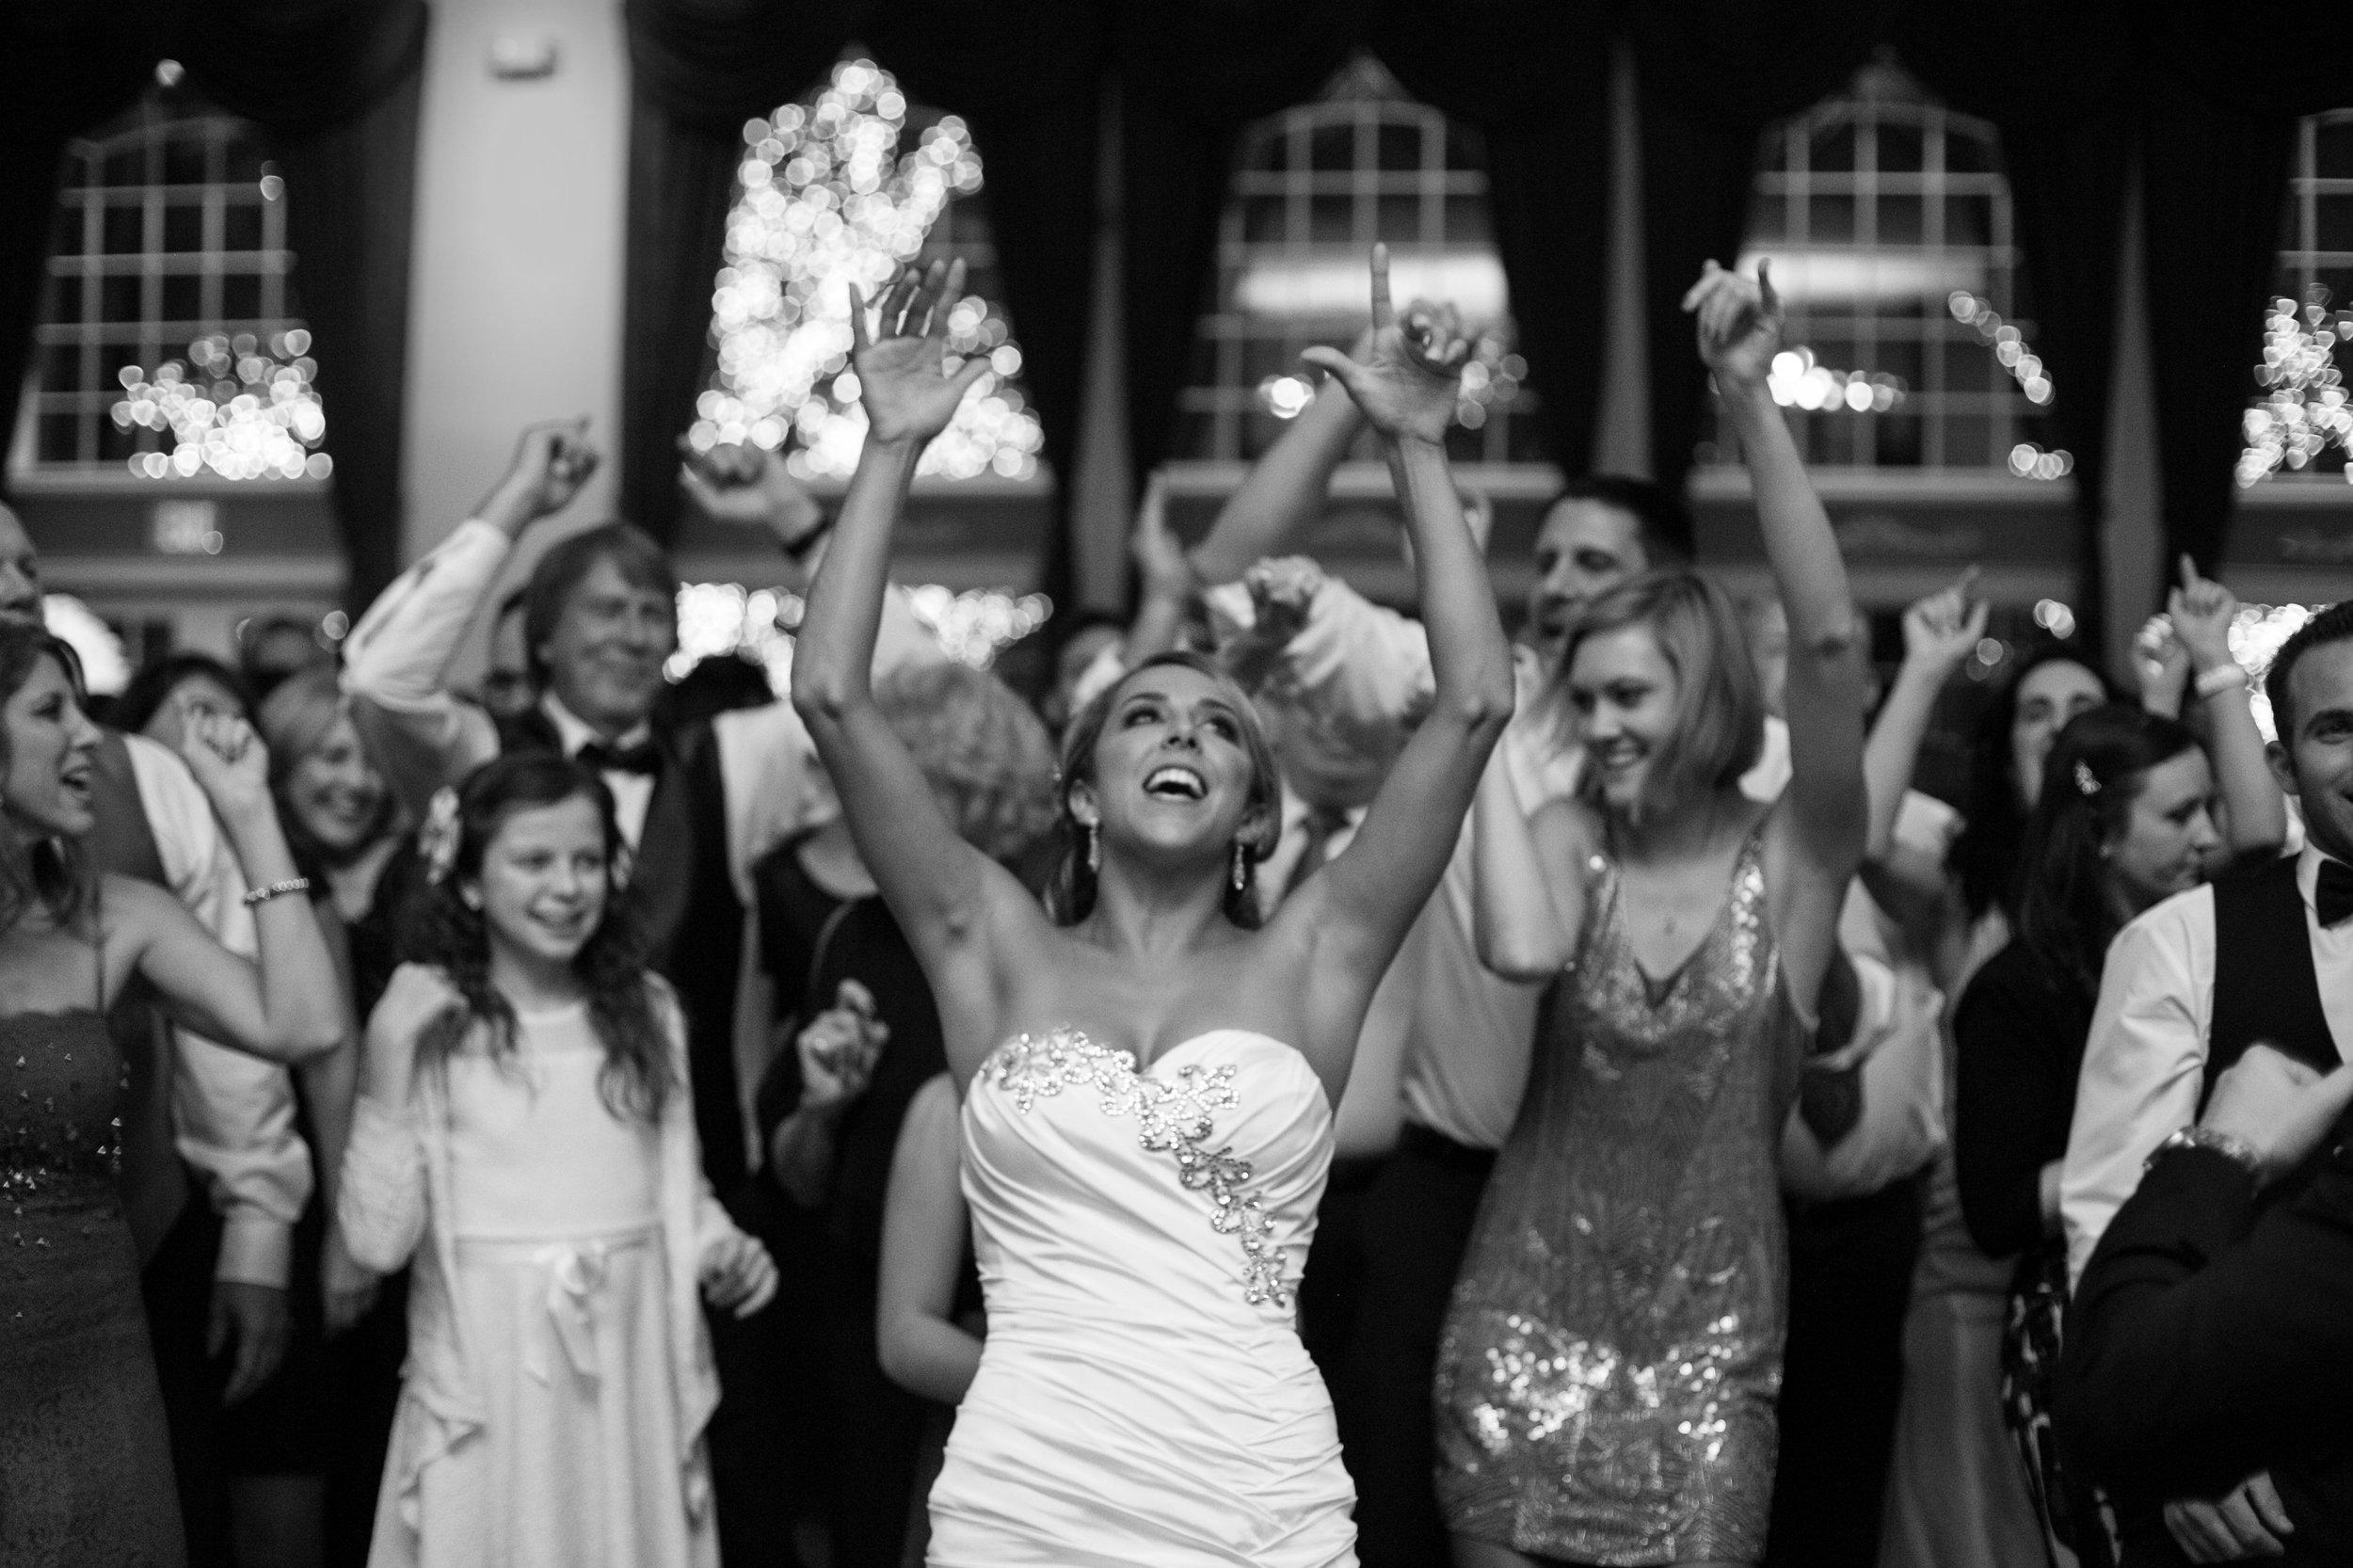 Ceci_New_York_Custom_Invitation_ New_Jersey_Wedding_Luxury_Personalized_Ceci_Style_Bride_Foil_Stamping73.jpg